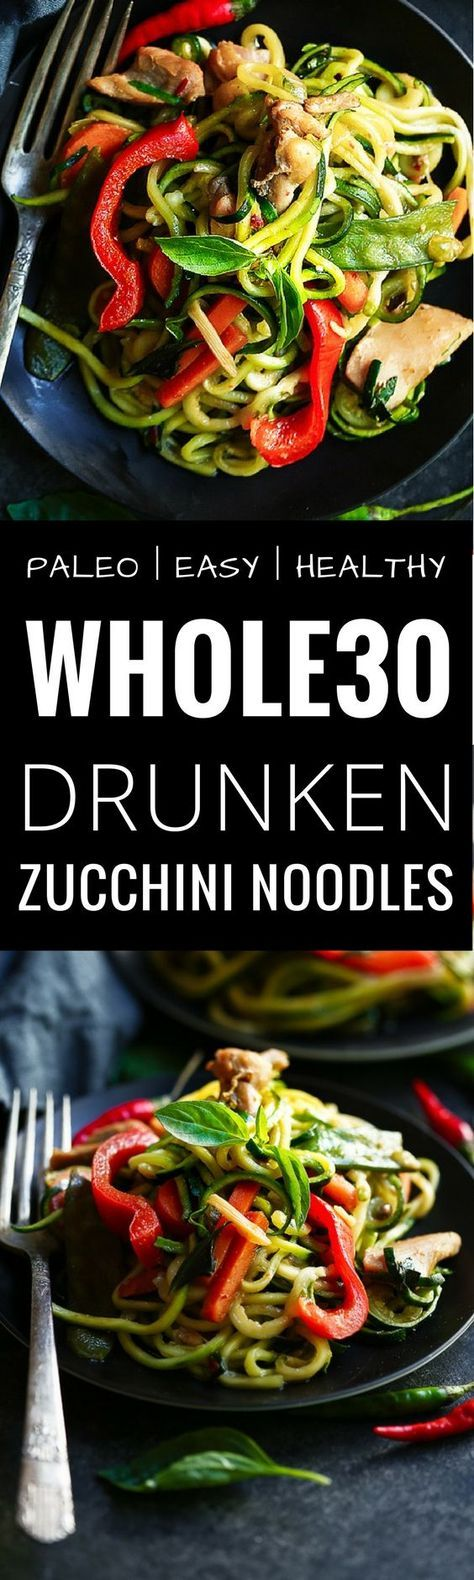 Whole30 Zucchini Noodle Bolognese.